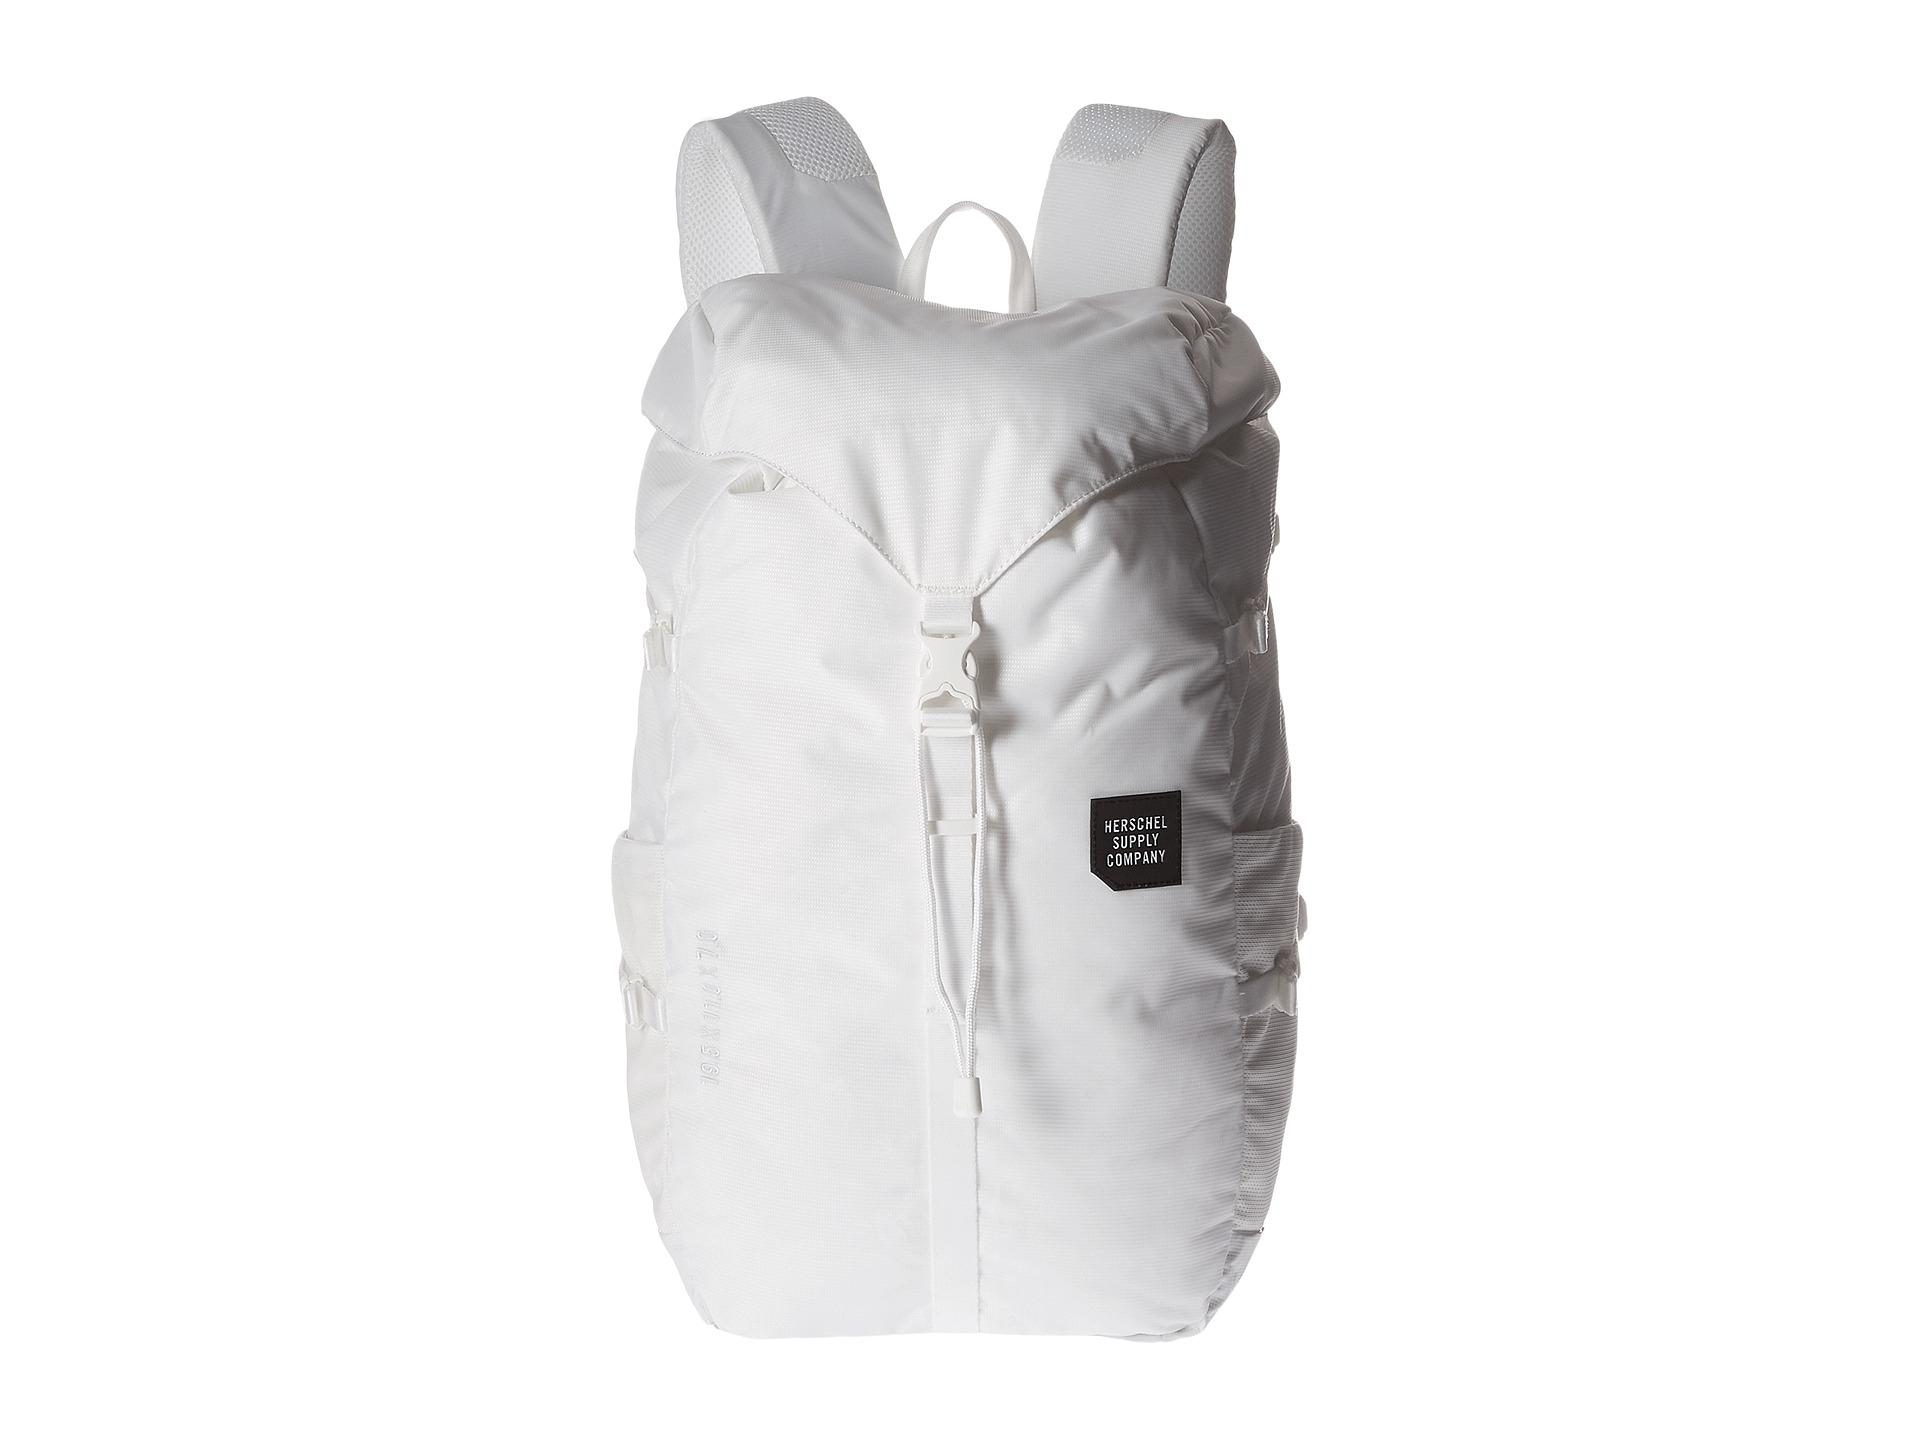 Lyst - Herschel Supply Co. Barlow Large in White for Men 5cf9e3890d527